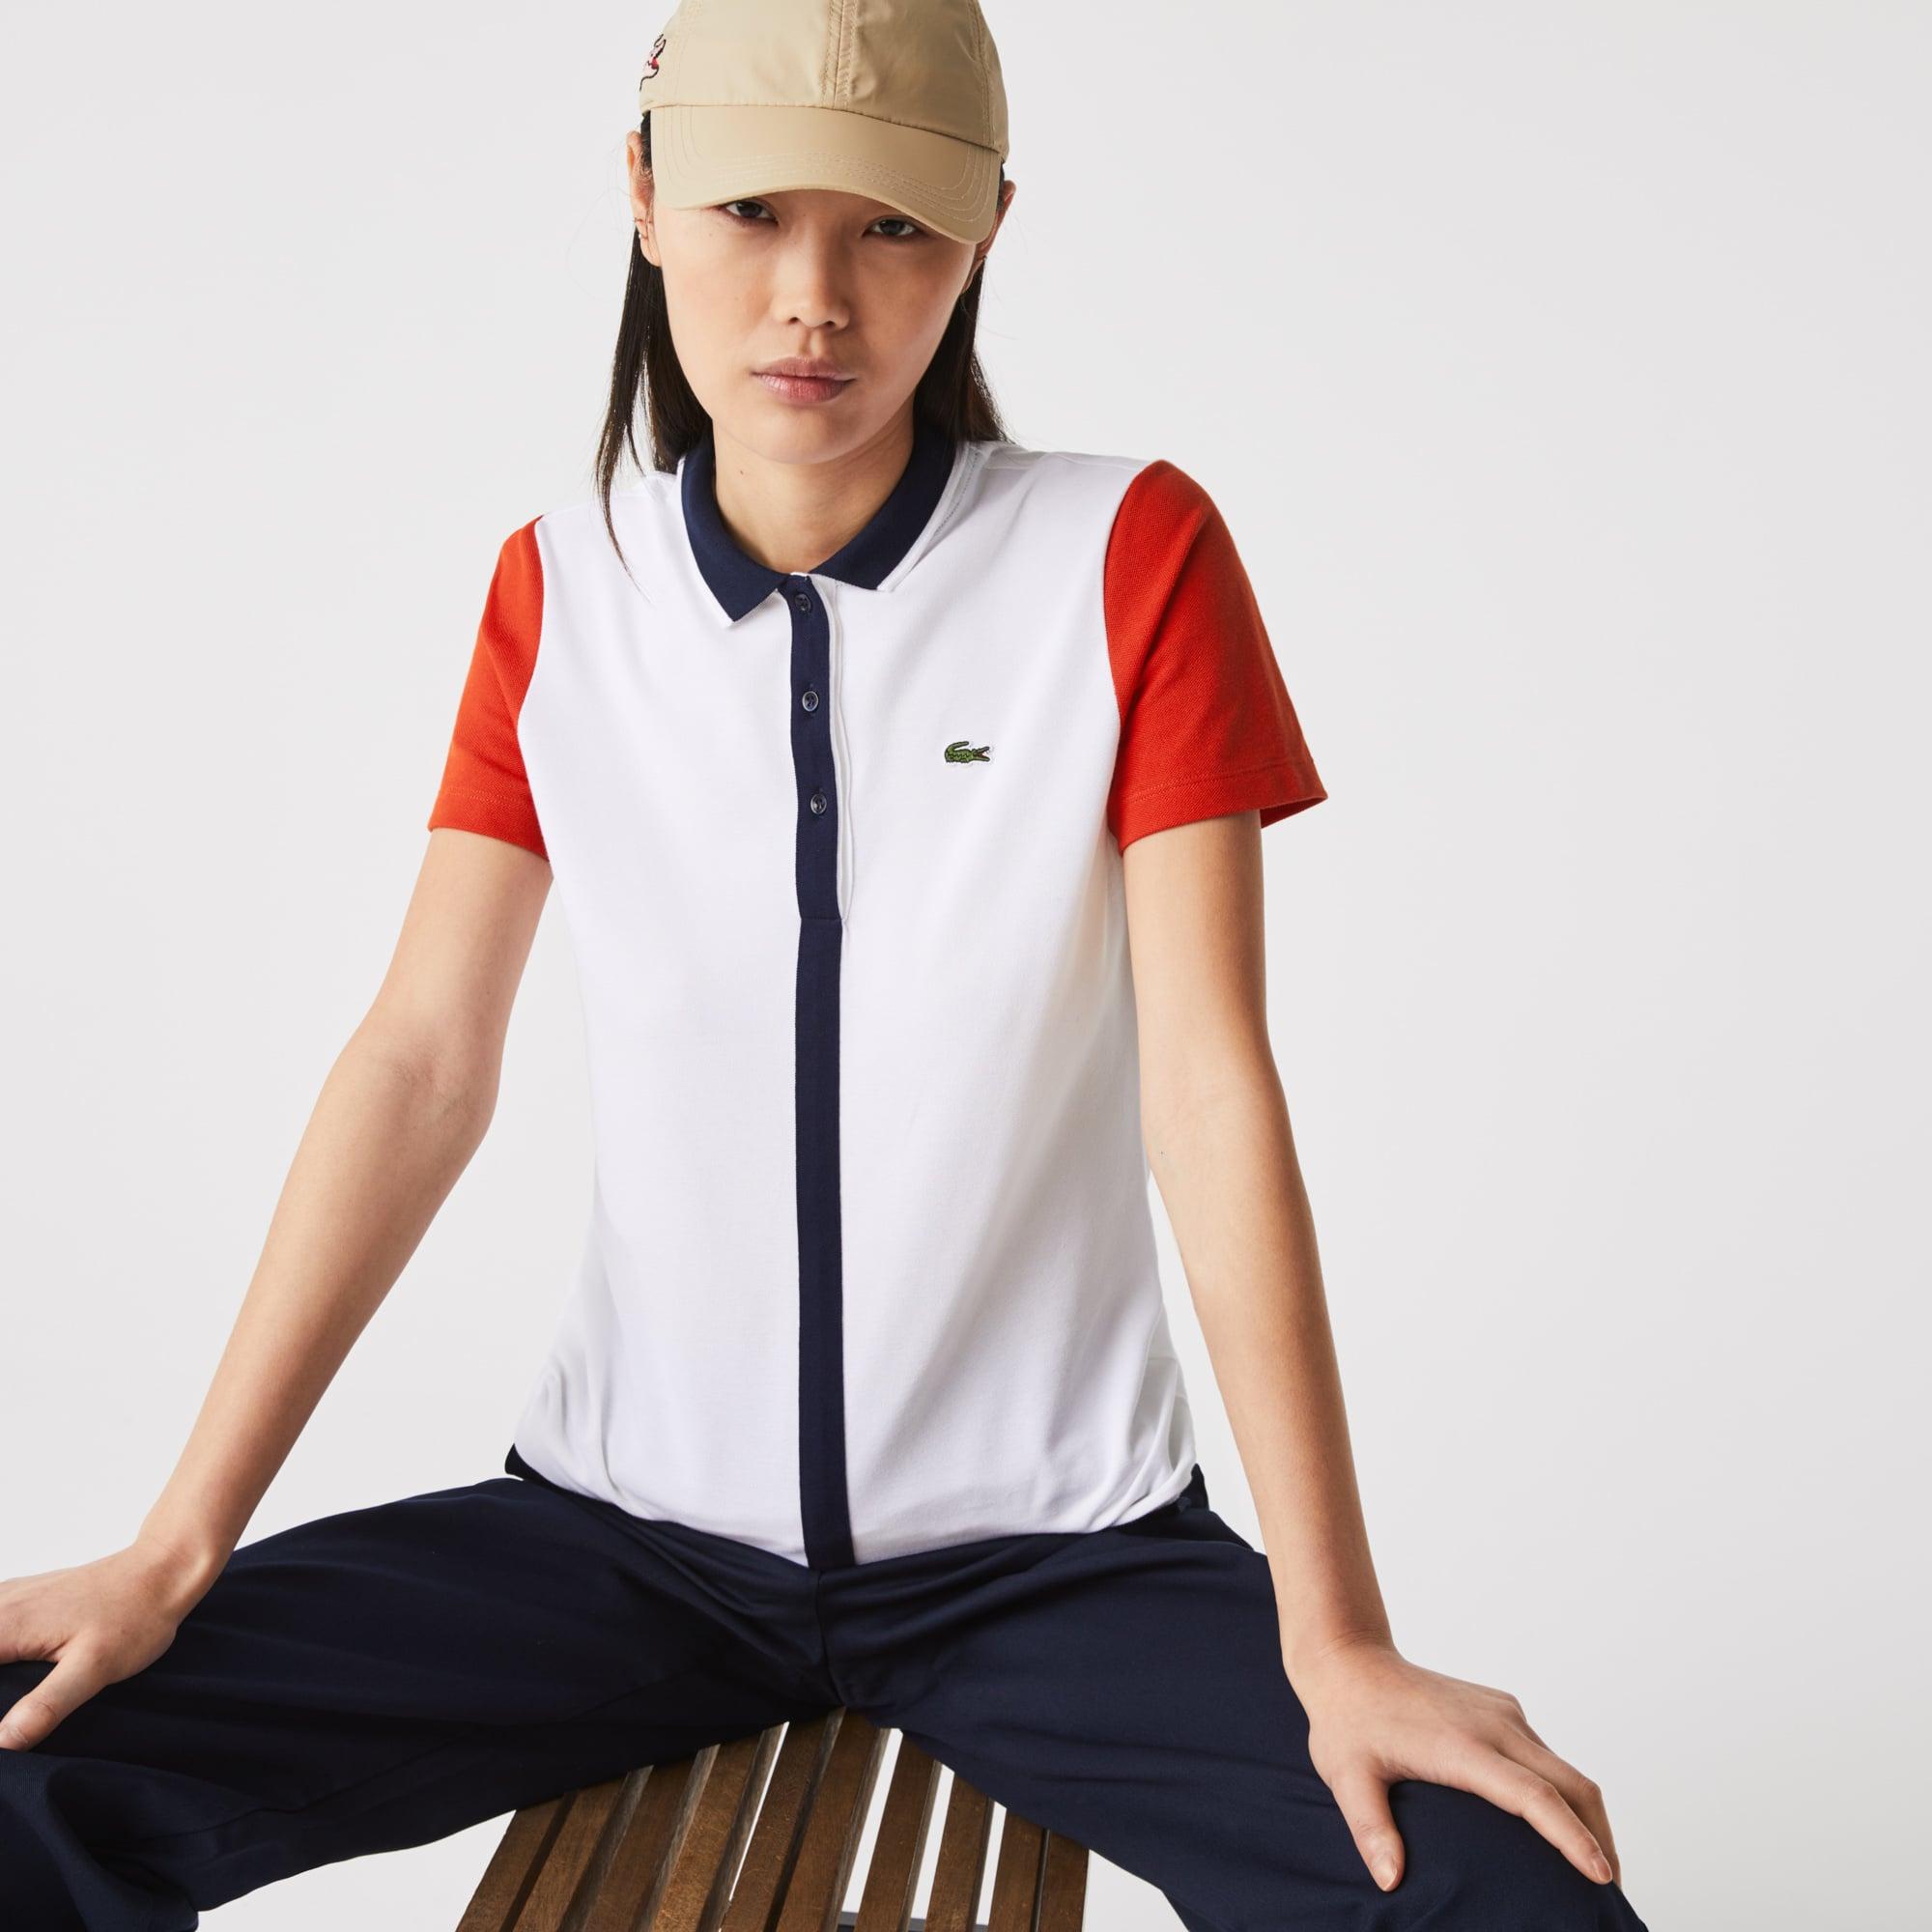 Lacoste Womens SPORT Roland Garros Color-Block Polo Shirt